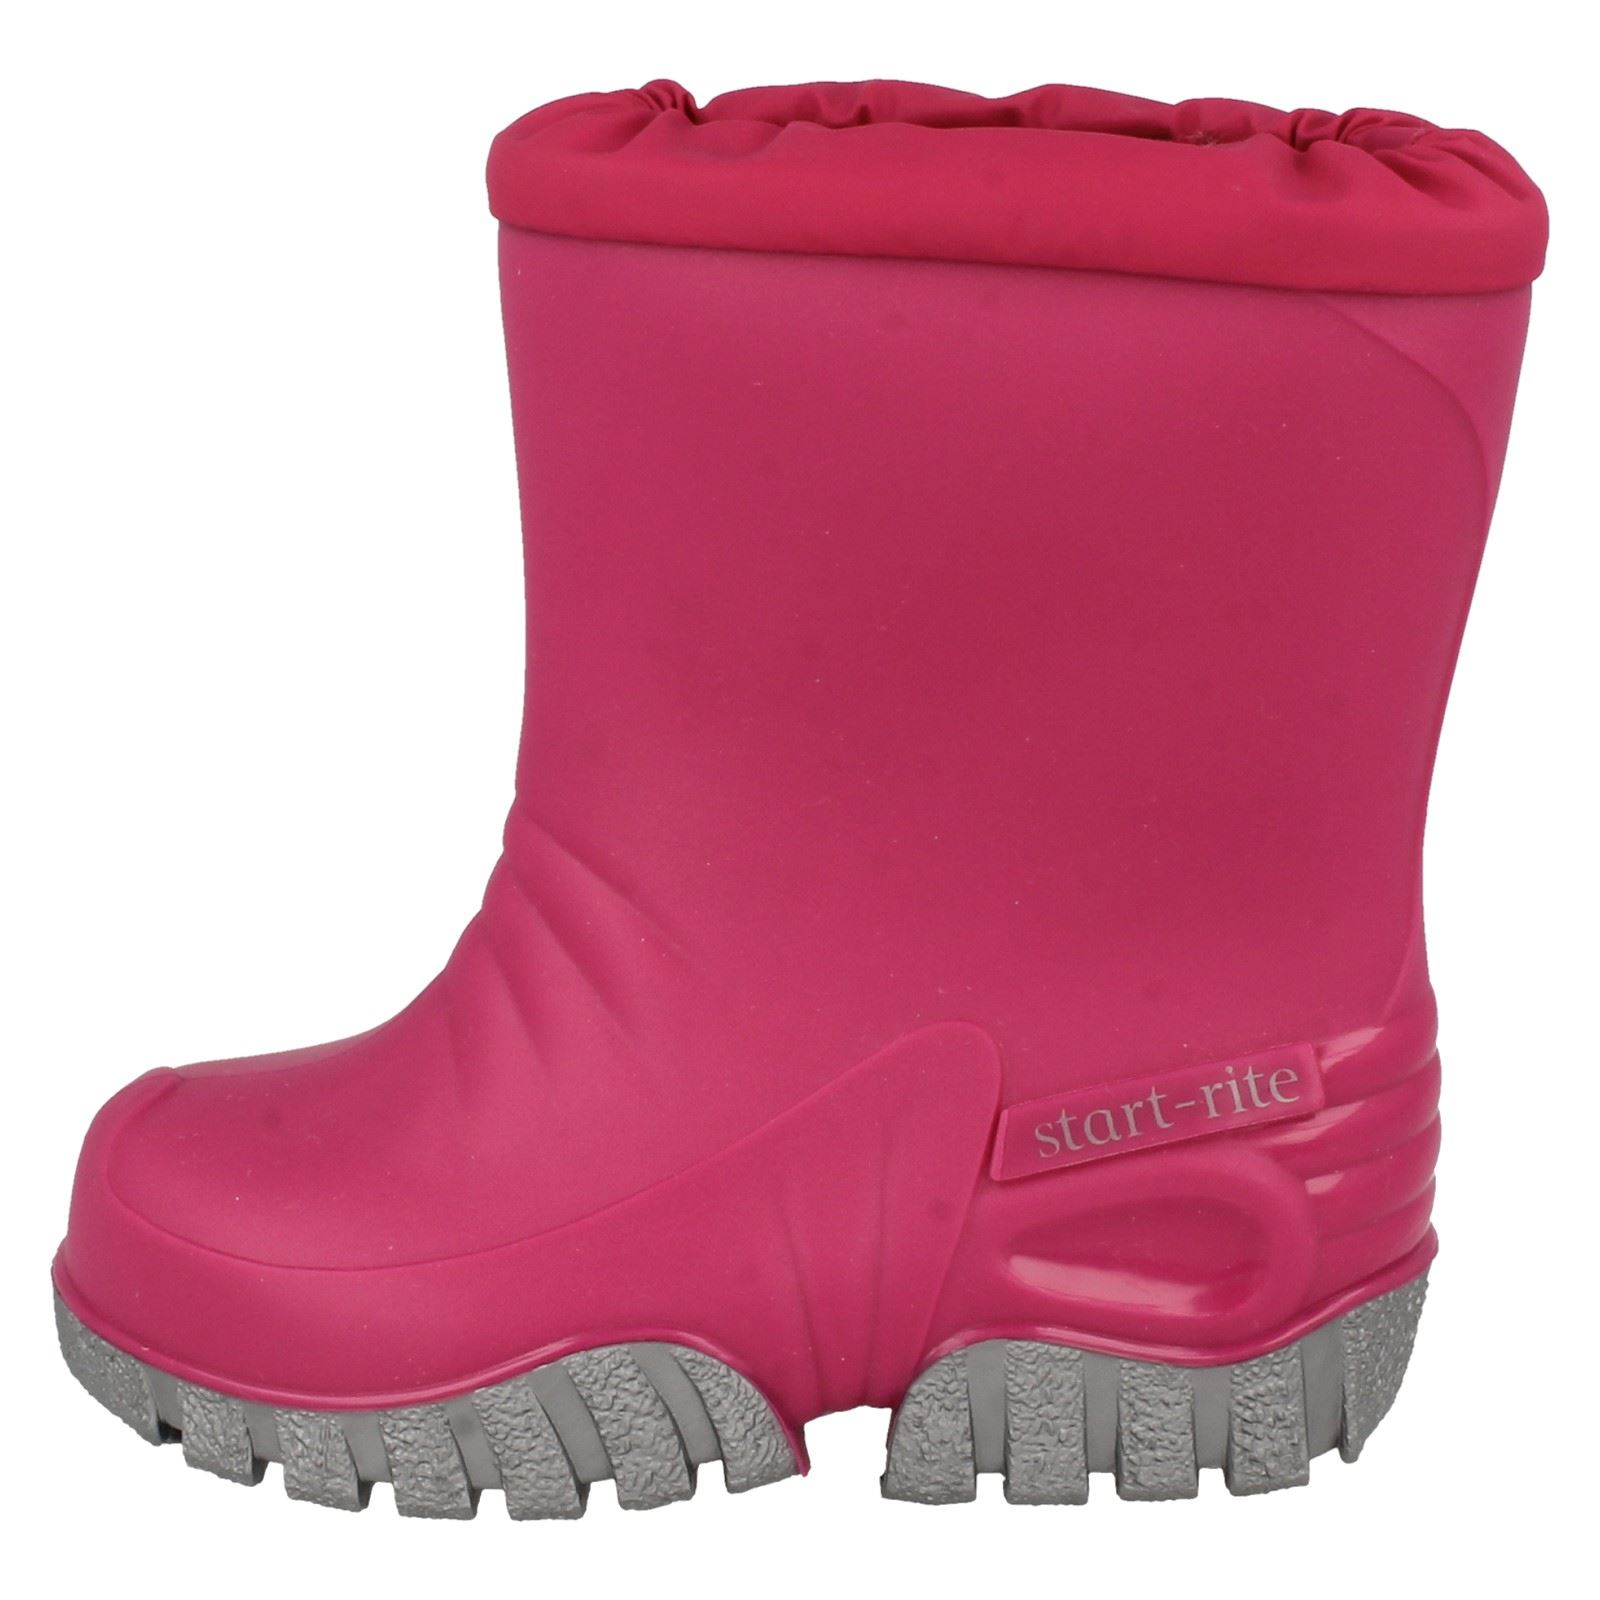 Childrens Unisex Boys Girls Startrite Fleece Wellingtons Mud Buster